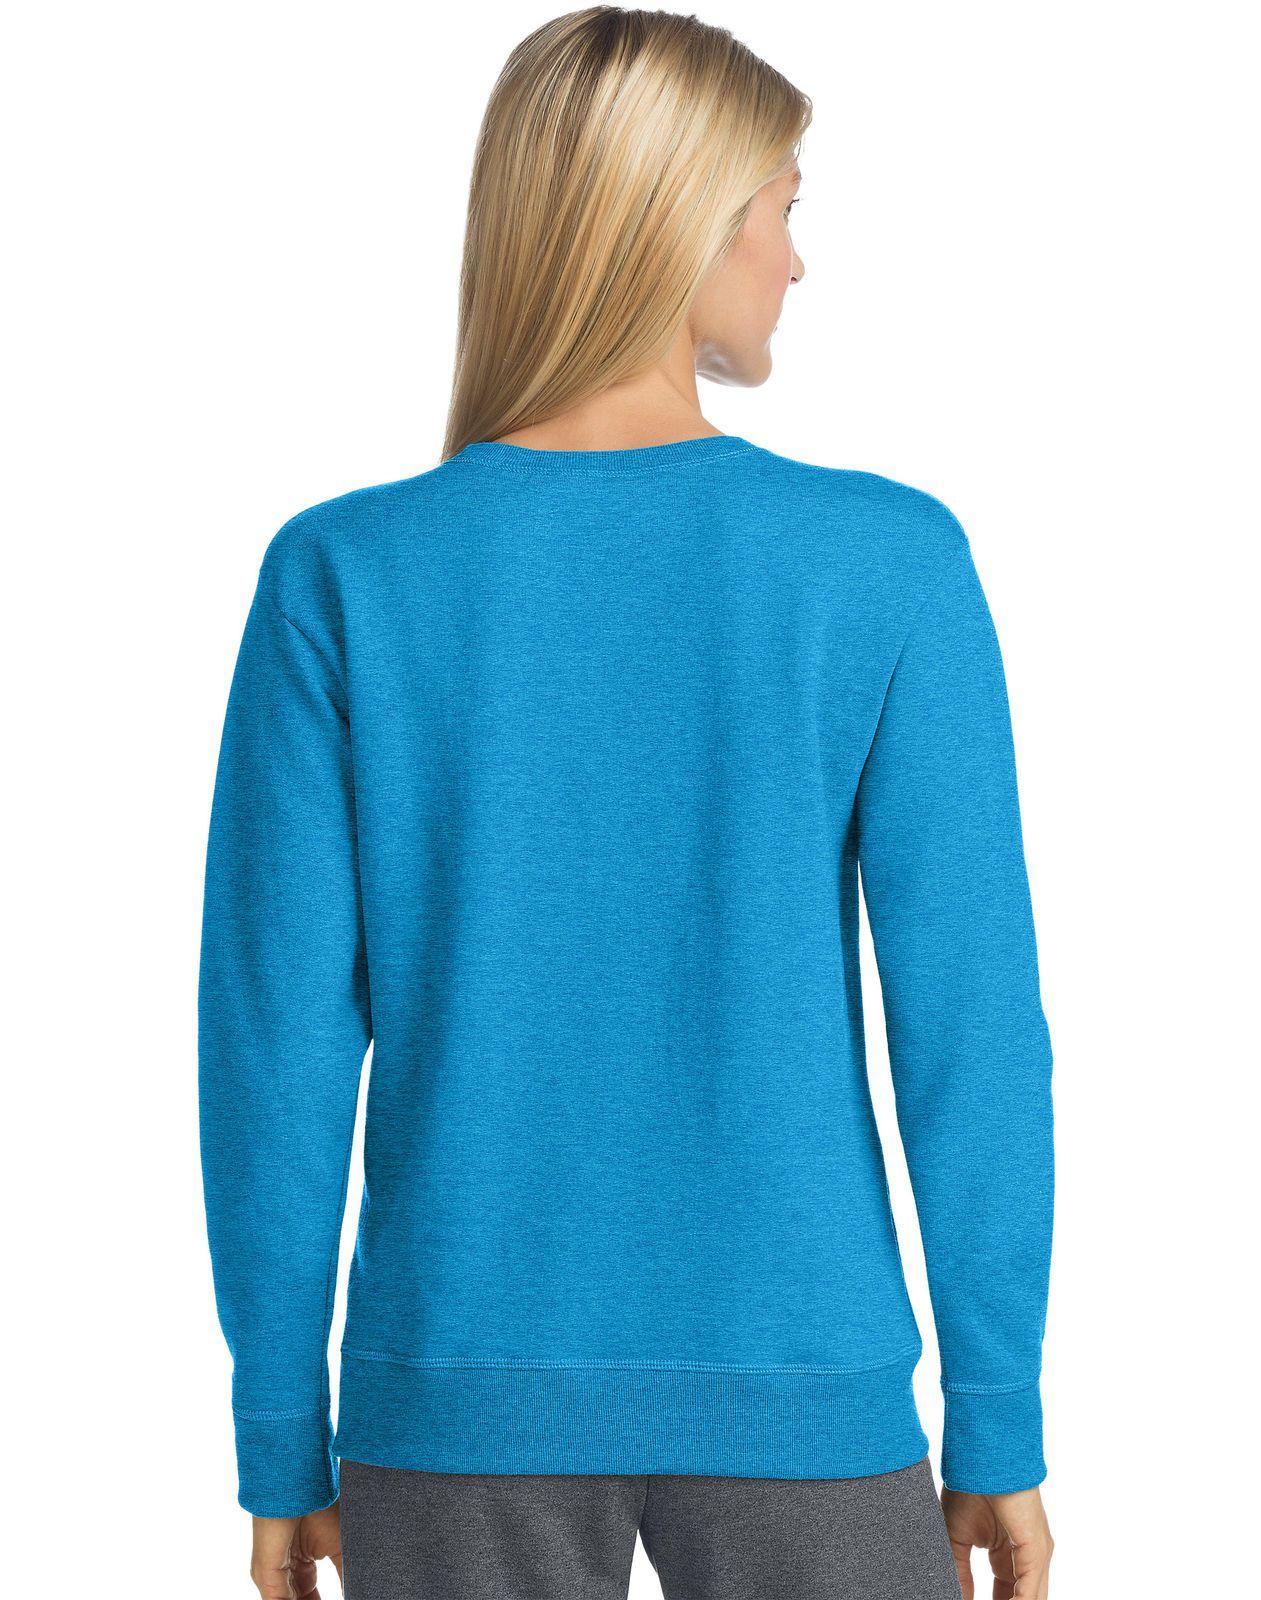 923e2fee8ef Women s Crewneck Sweatshirt Hanes ComfortSoft EcoSmart Fleece Ribbed Hem  Cuffs  11.5 End Date  2019-